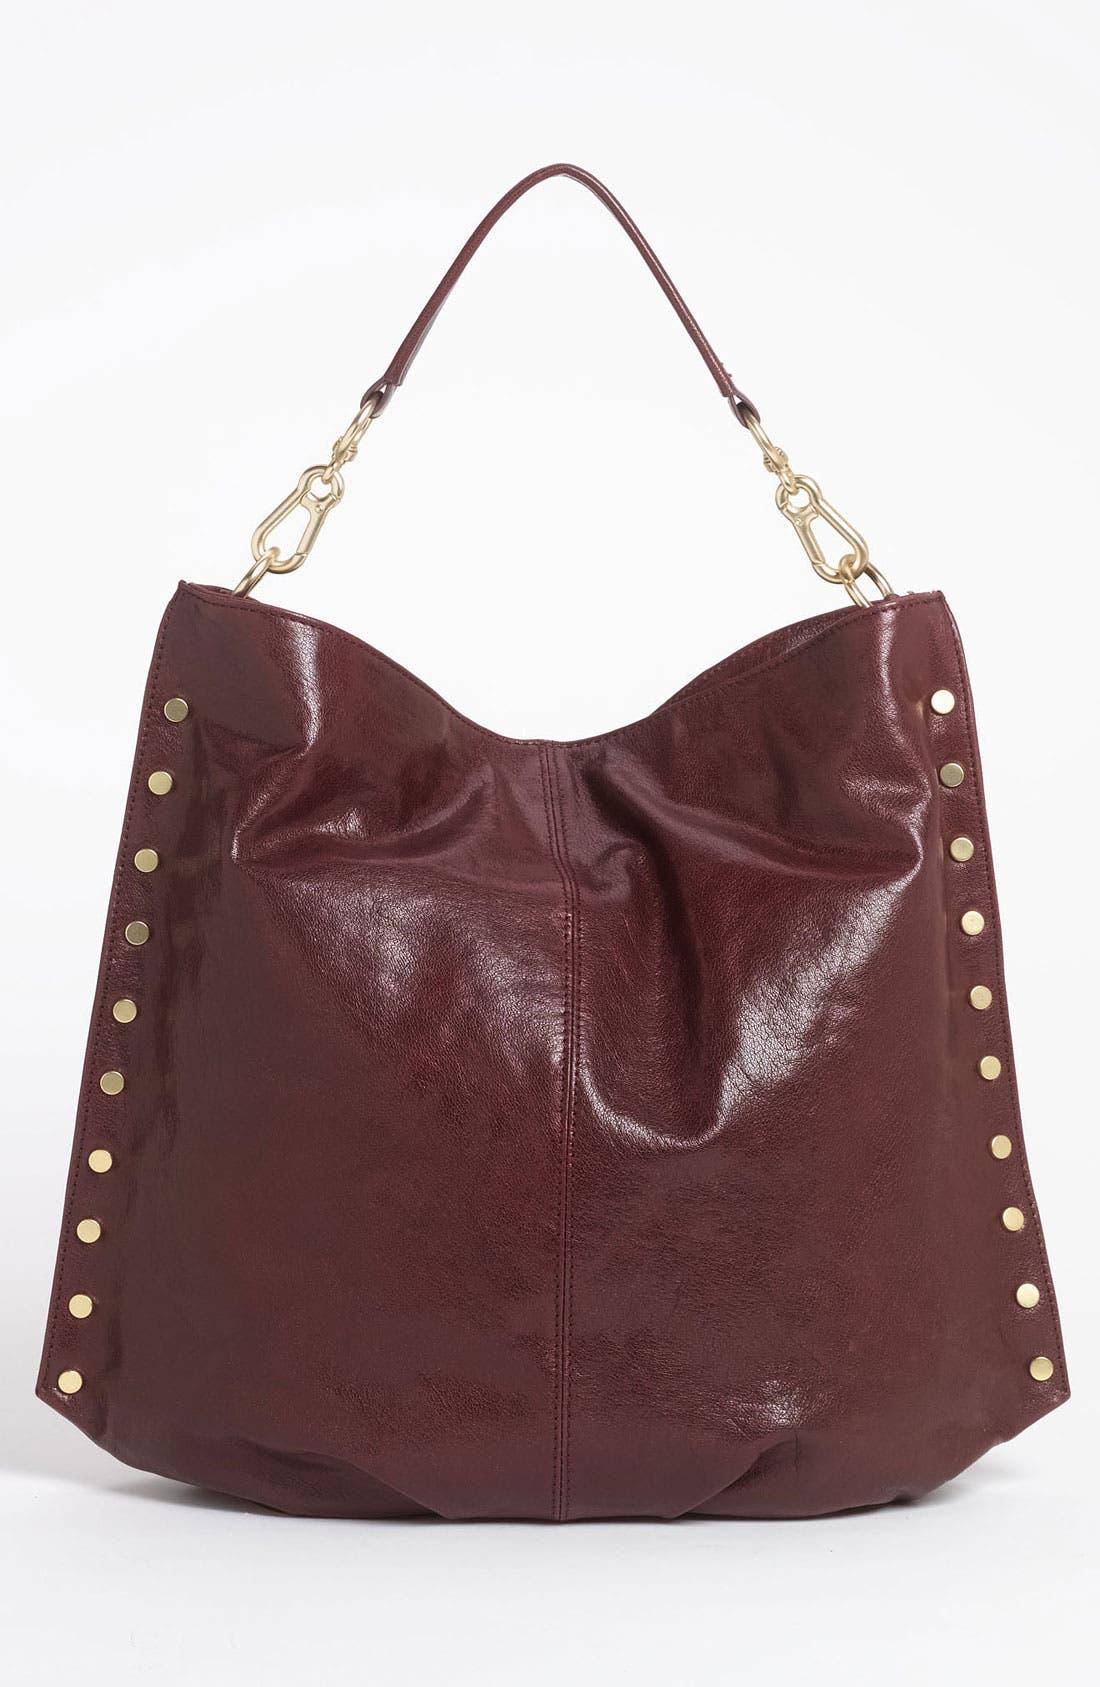 Main Image - Sloane & Alex 'Angie' Leather Hobo